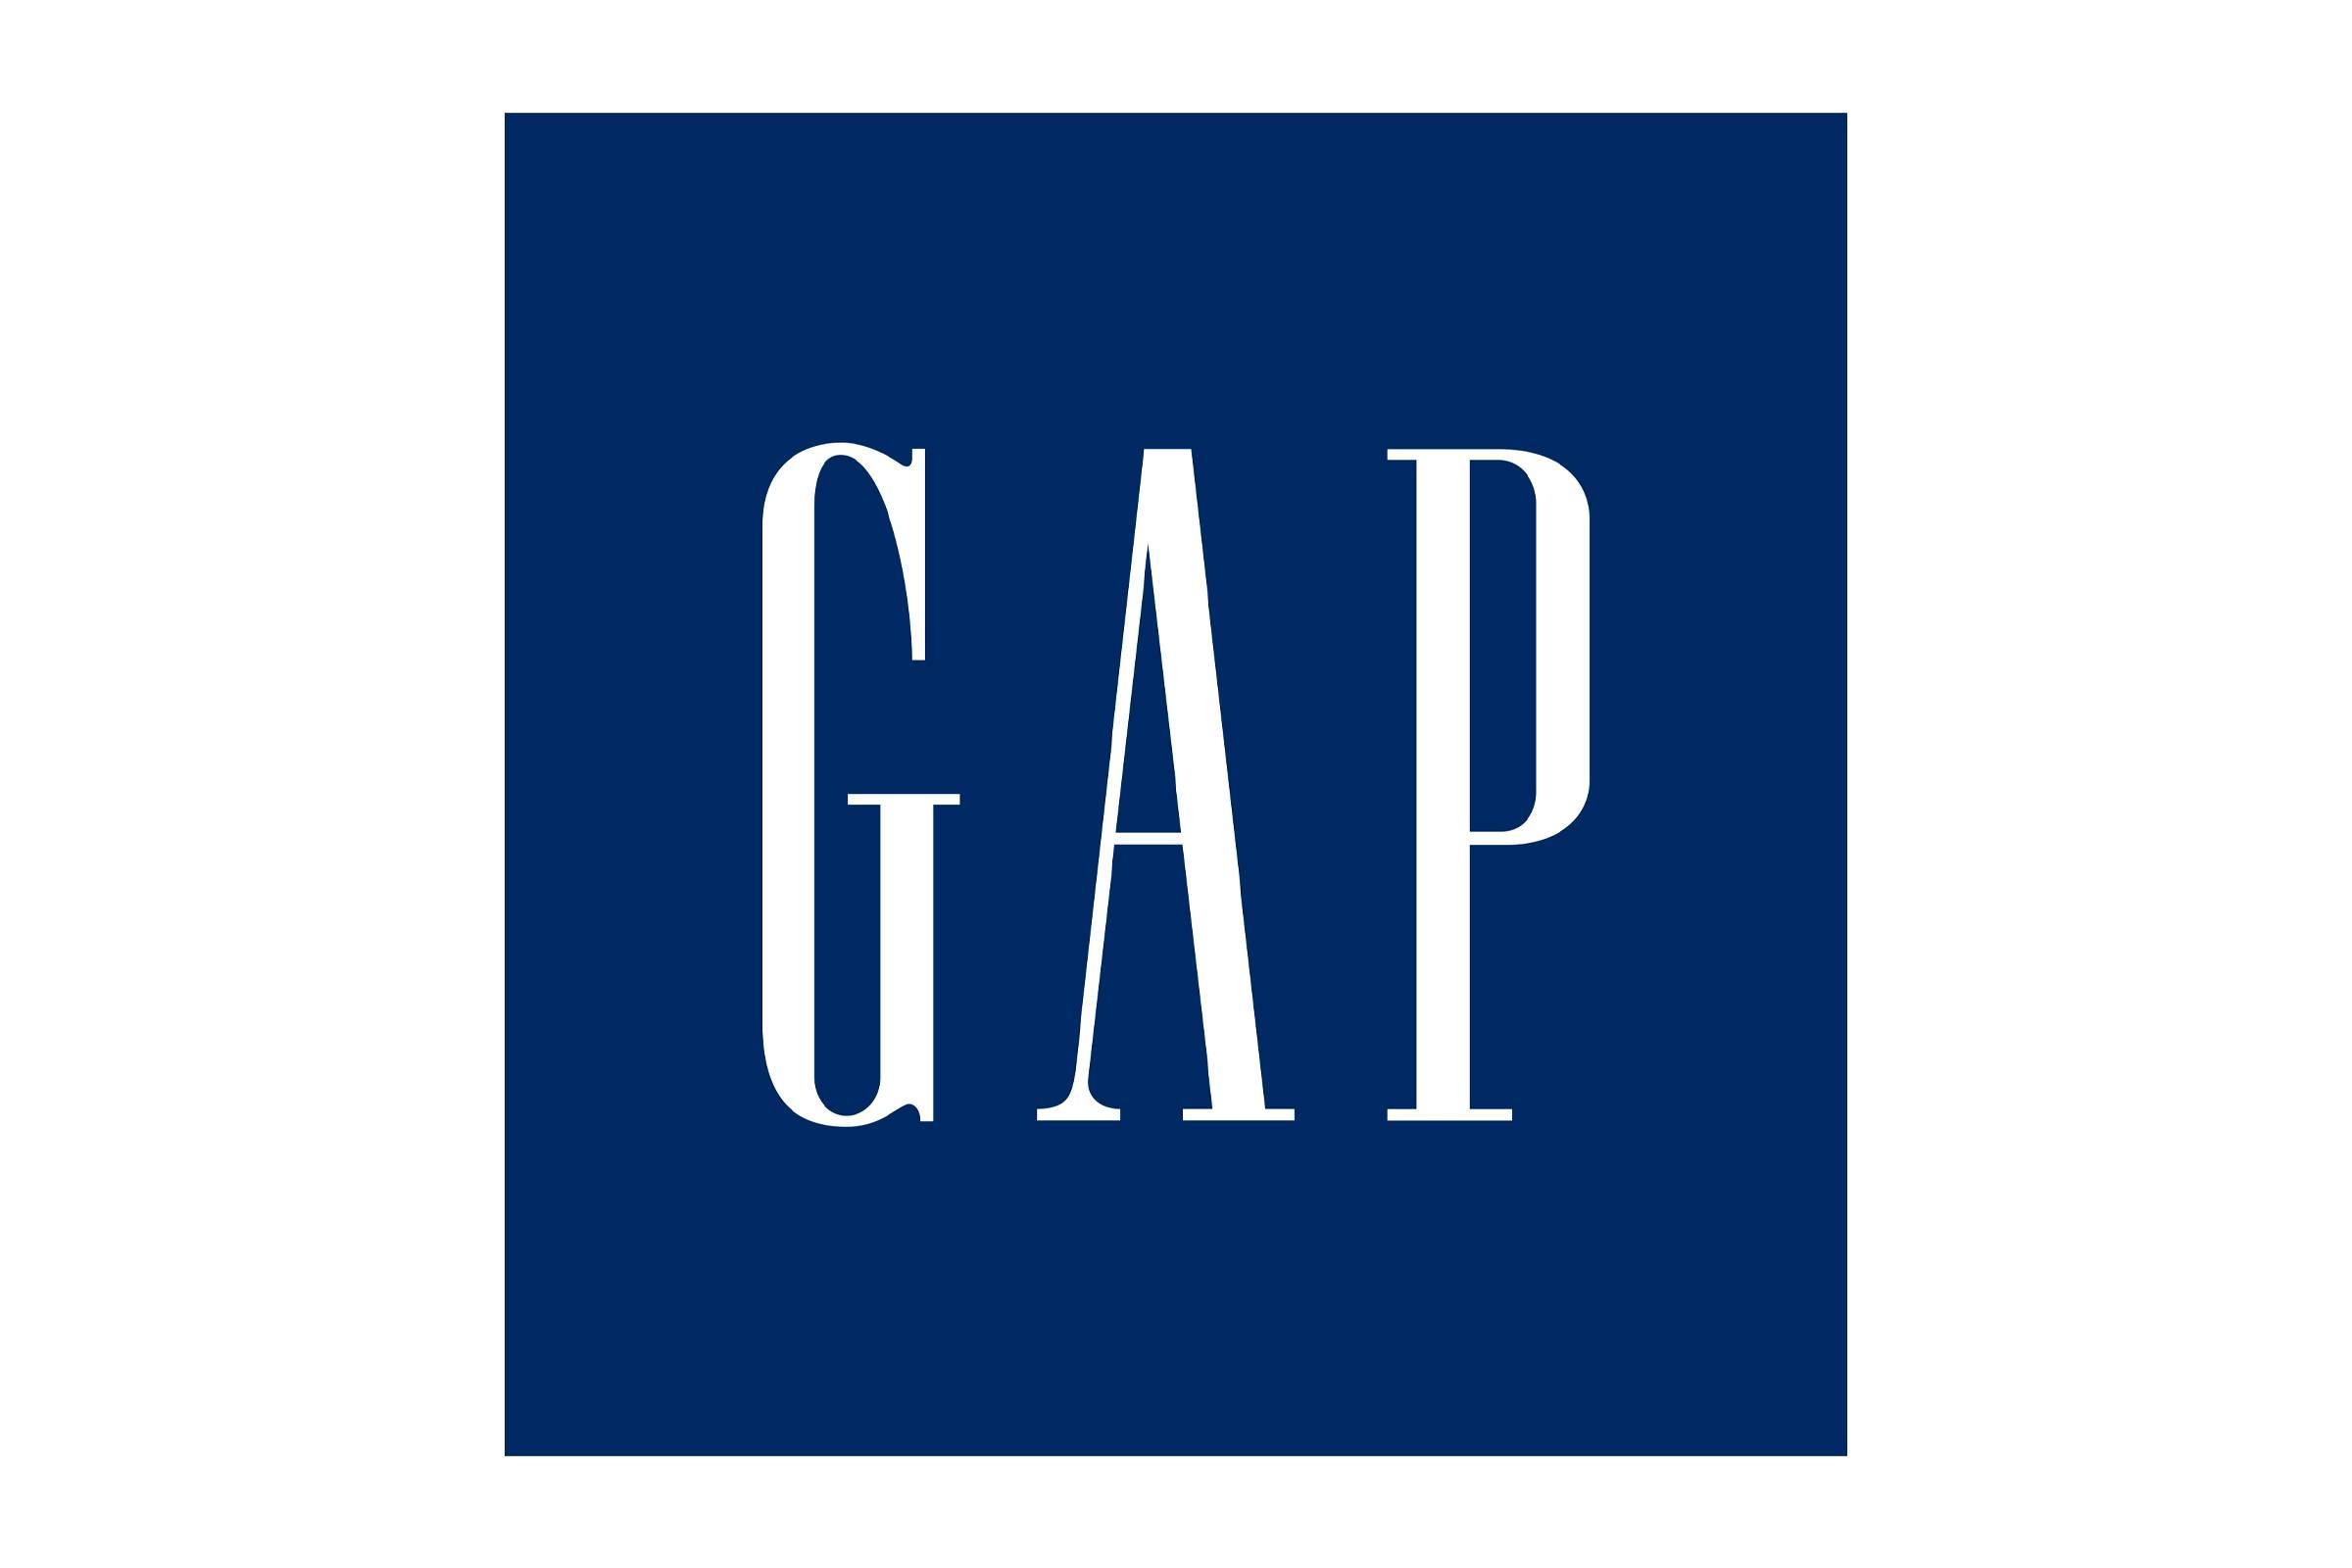 Normcore Fashion Brands: Gap